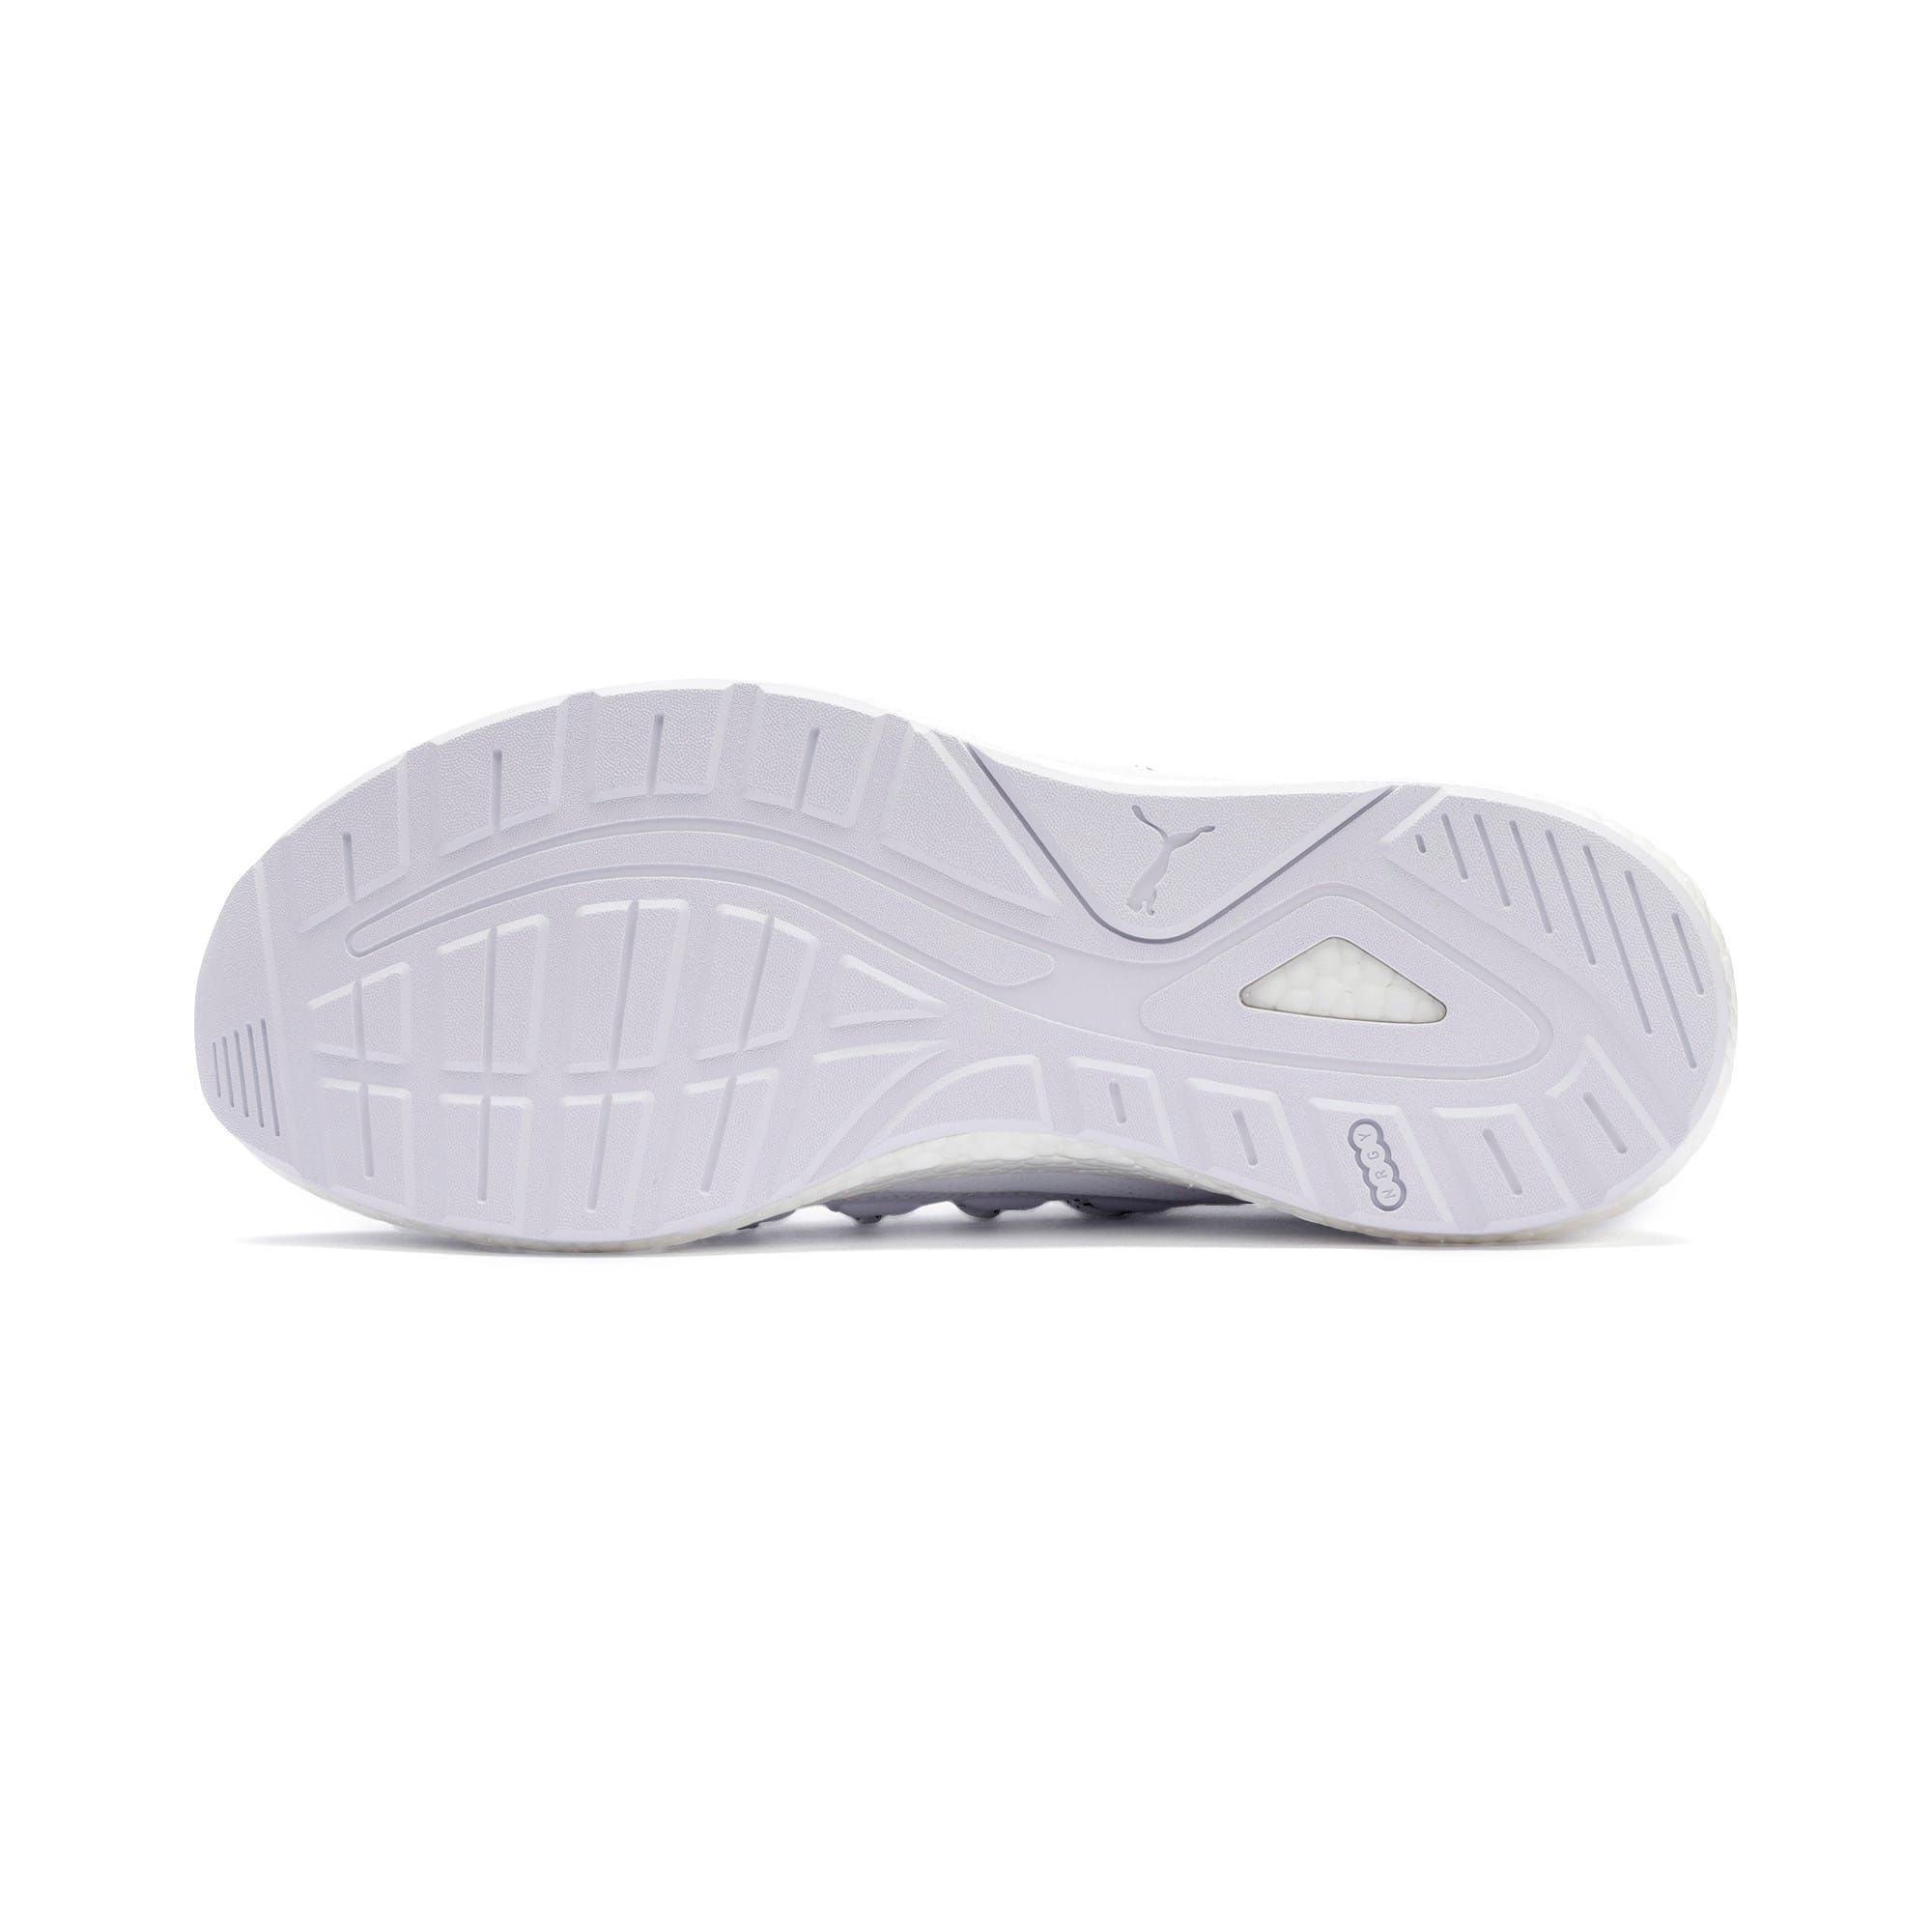 Thumbnail 7 of NRGY Neko Lights Men's Running Shoes, Puma White, medium-IND